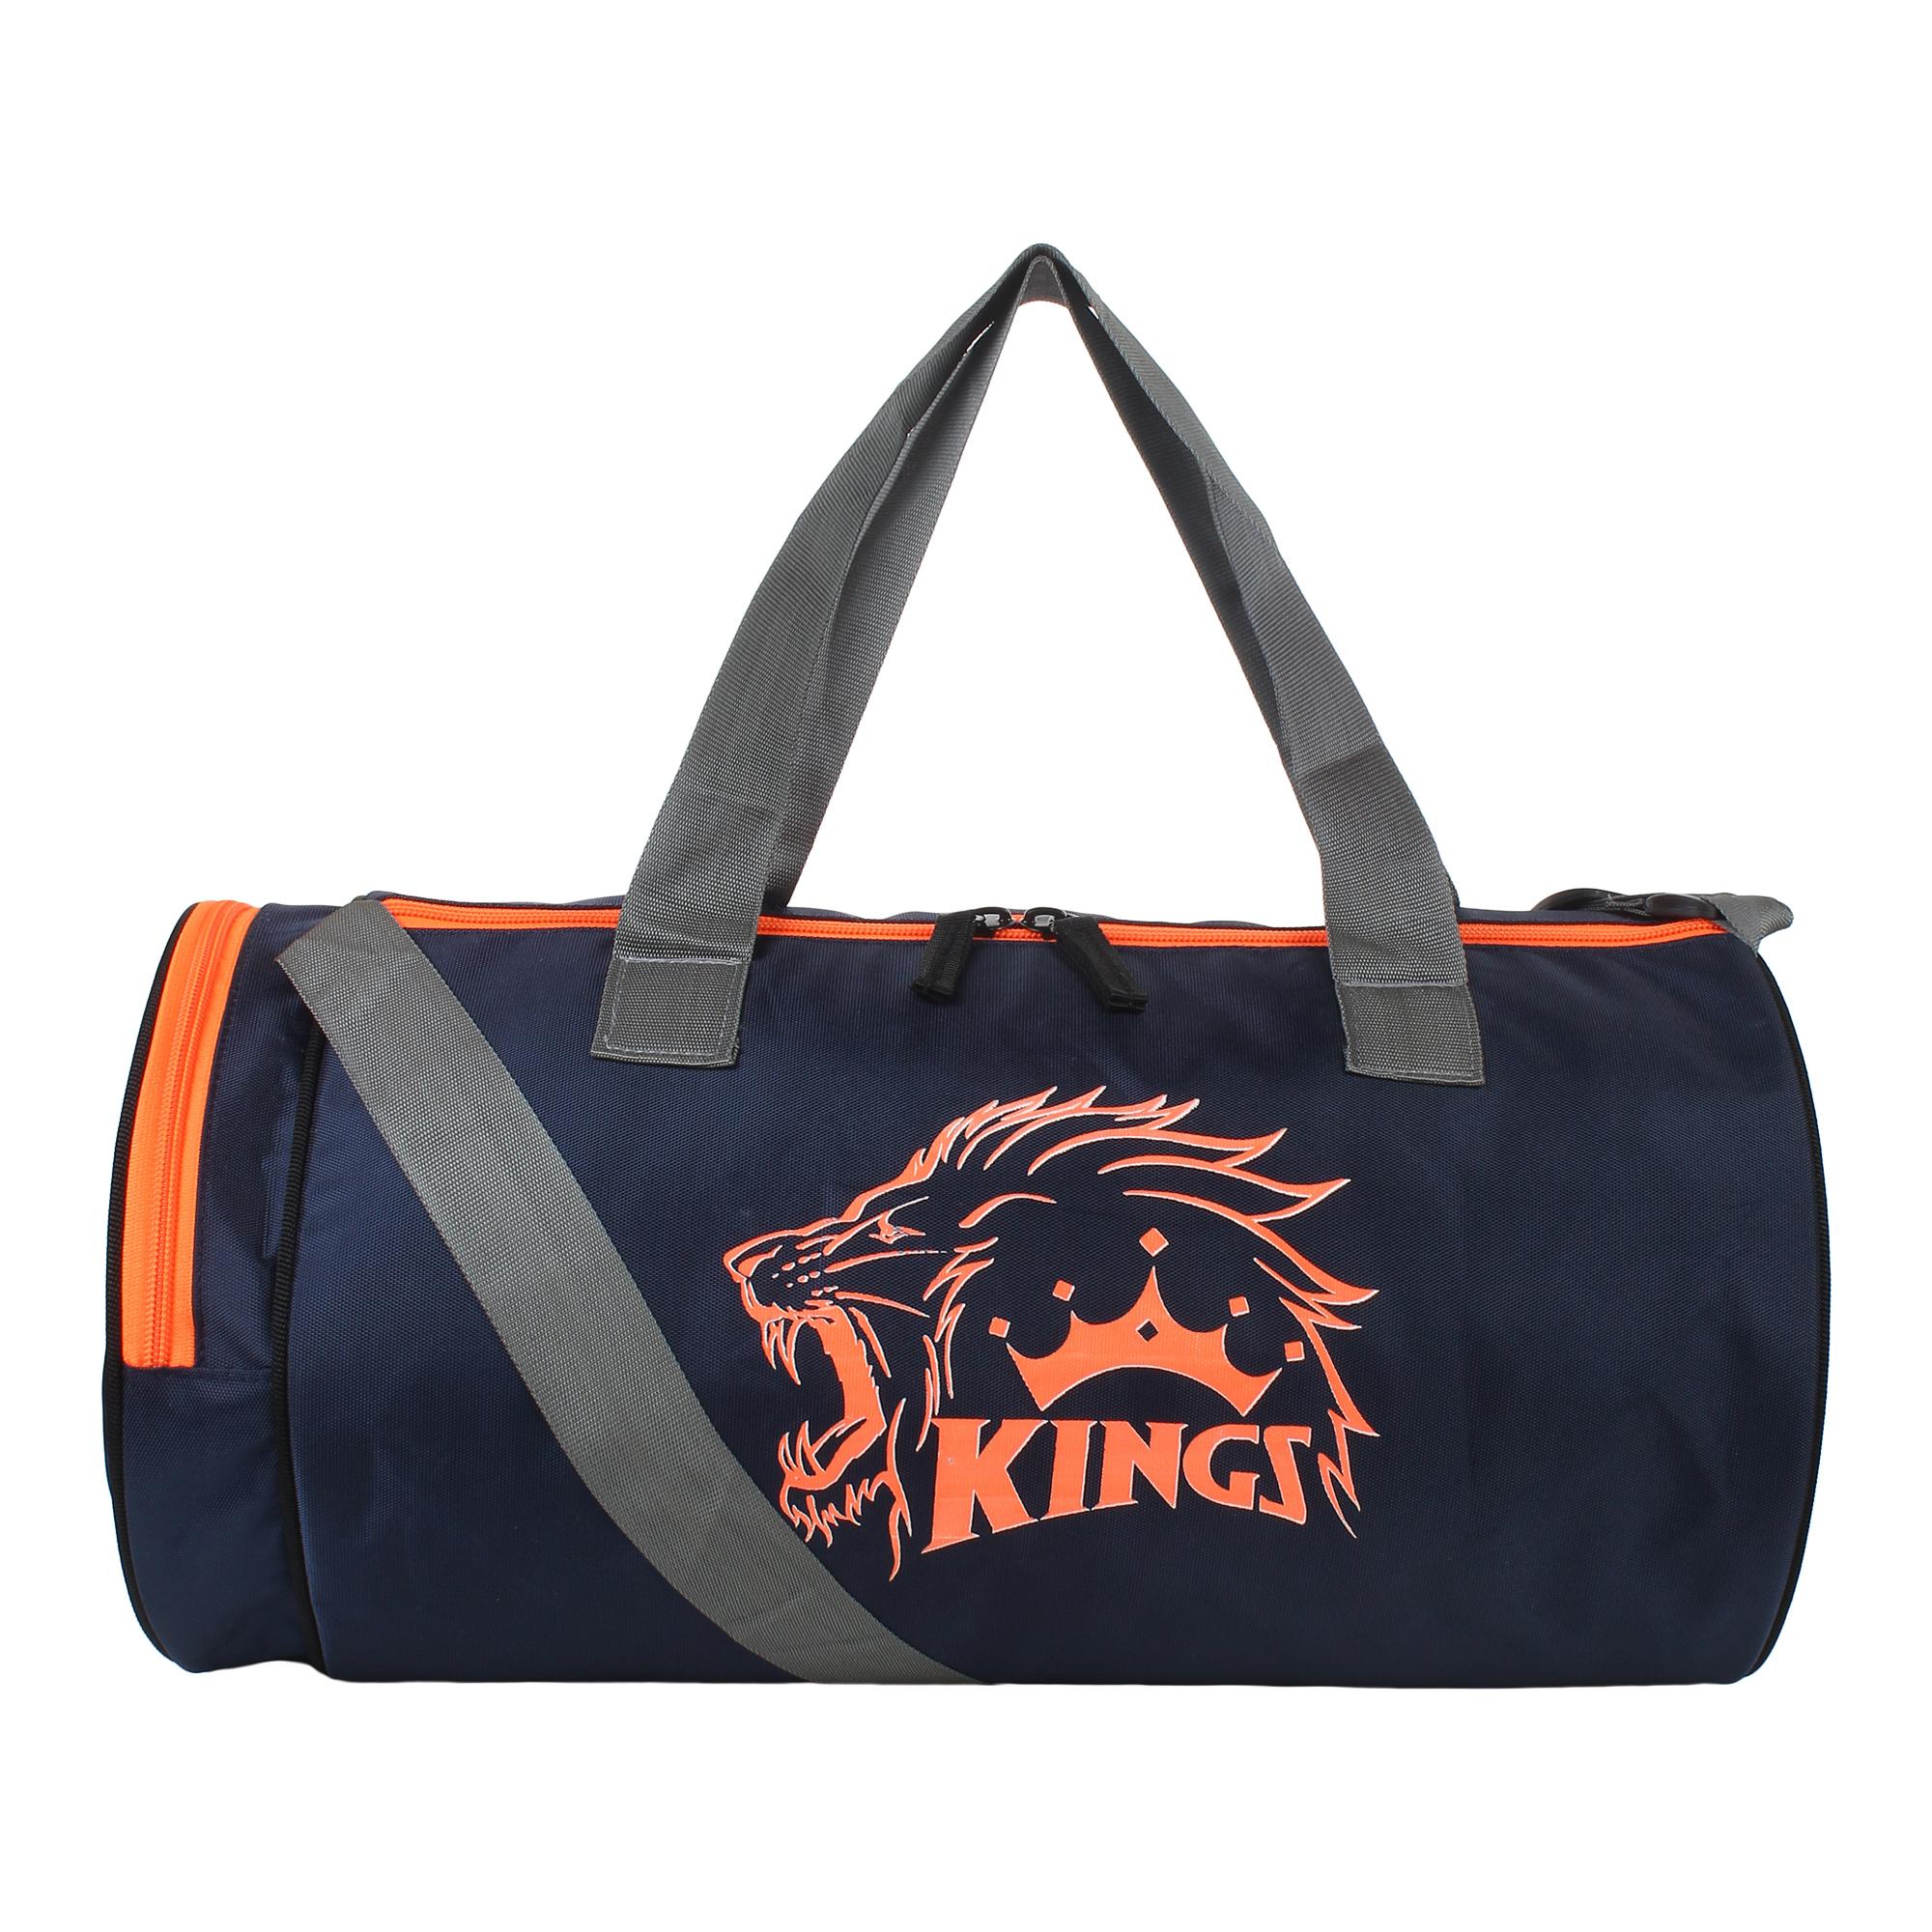 Fashion 7 Gym Bag   Duffel Bag for Fitness Freaks Stylish Printed Sports Bag